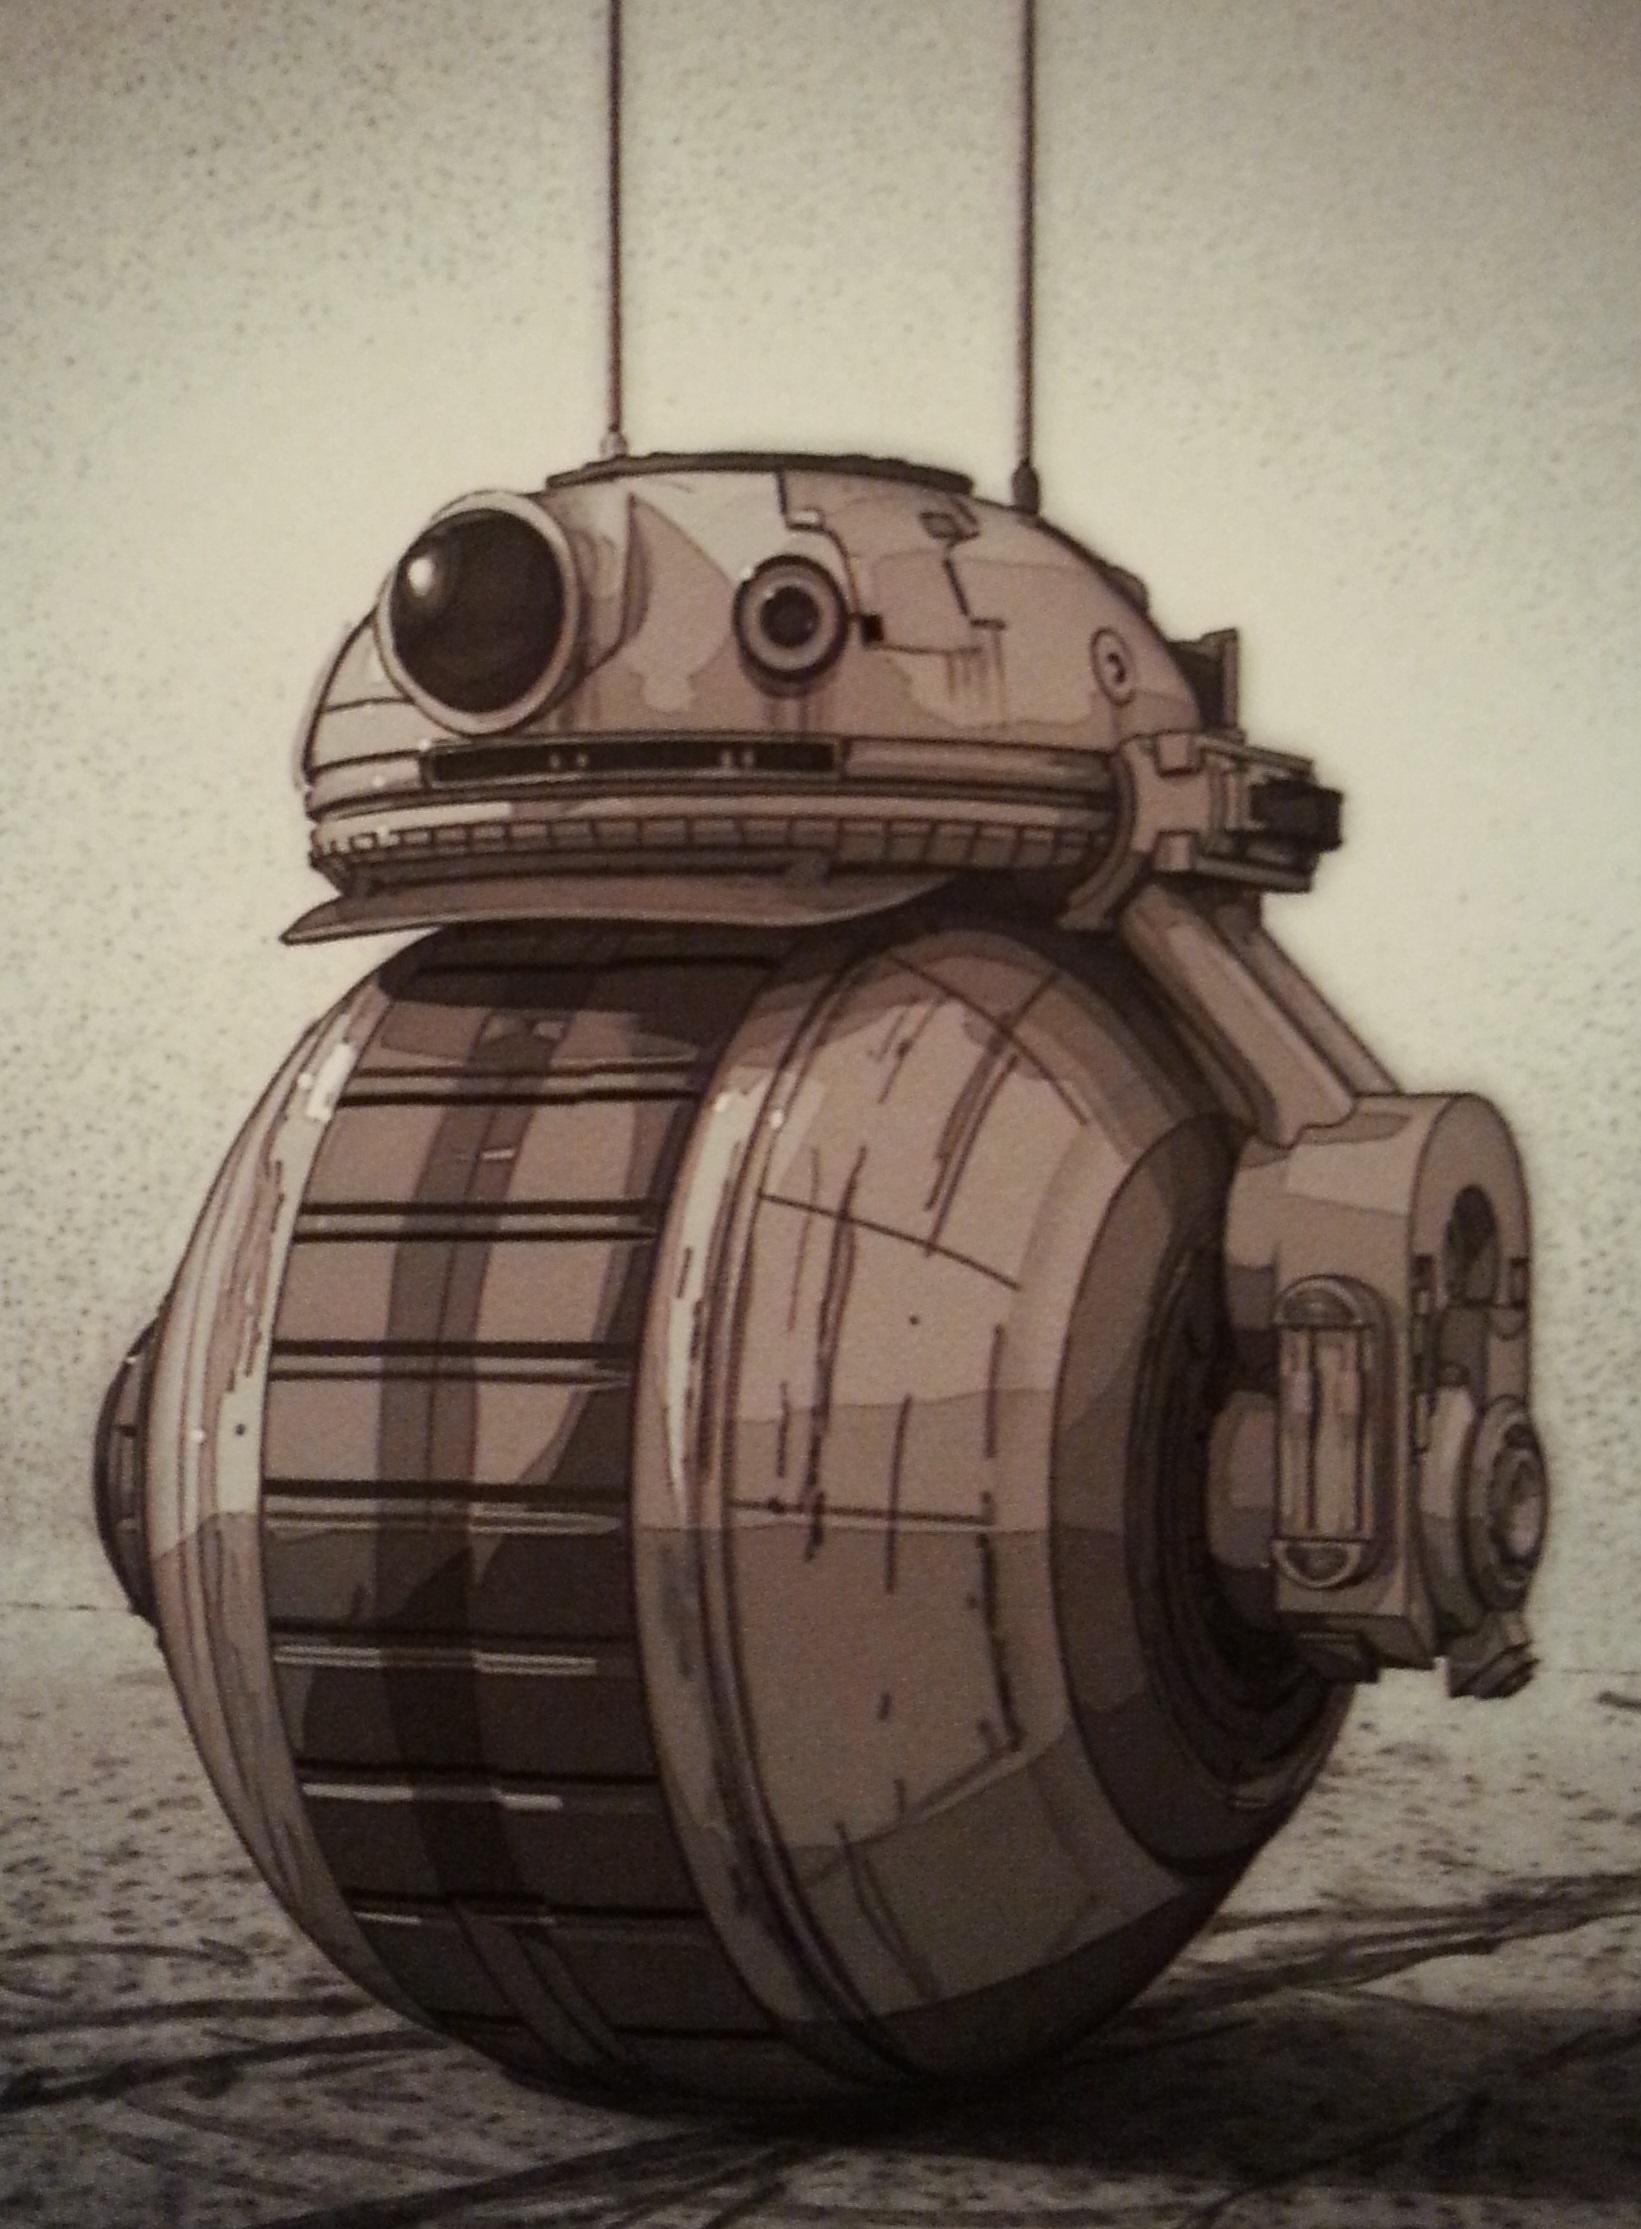 08-13 BB-8 Concept 1